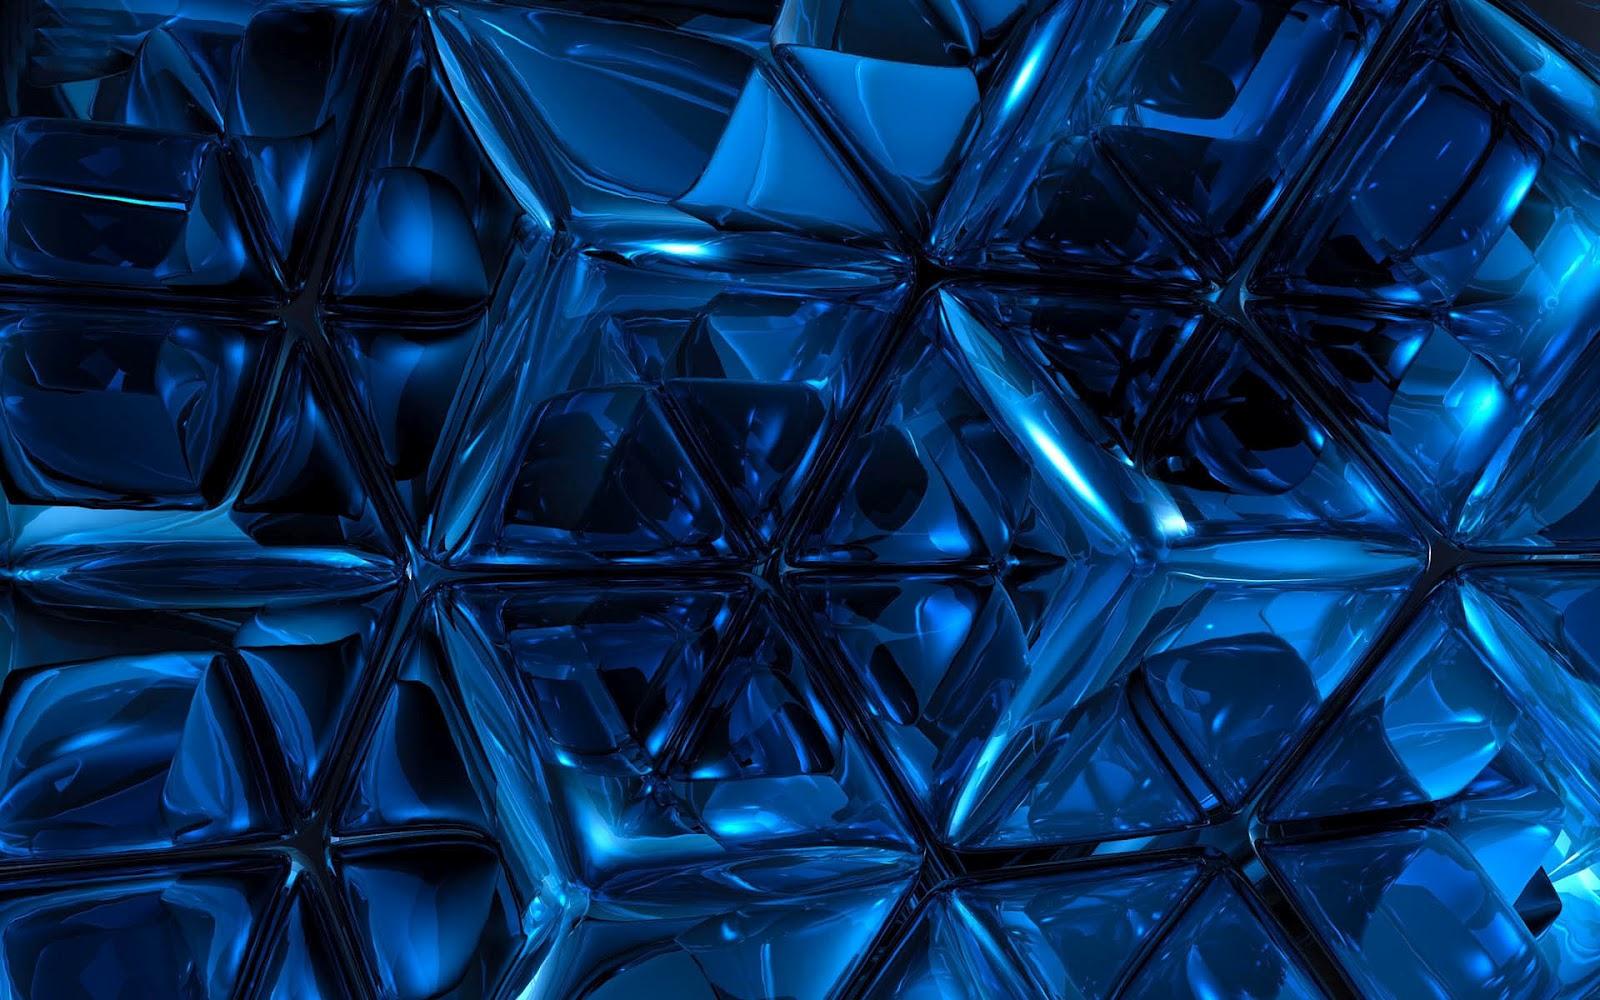 Spring 3d Live Wallpaper 3d Glass Wallpapers Top Best Hd Wallpapers For Desktop